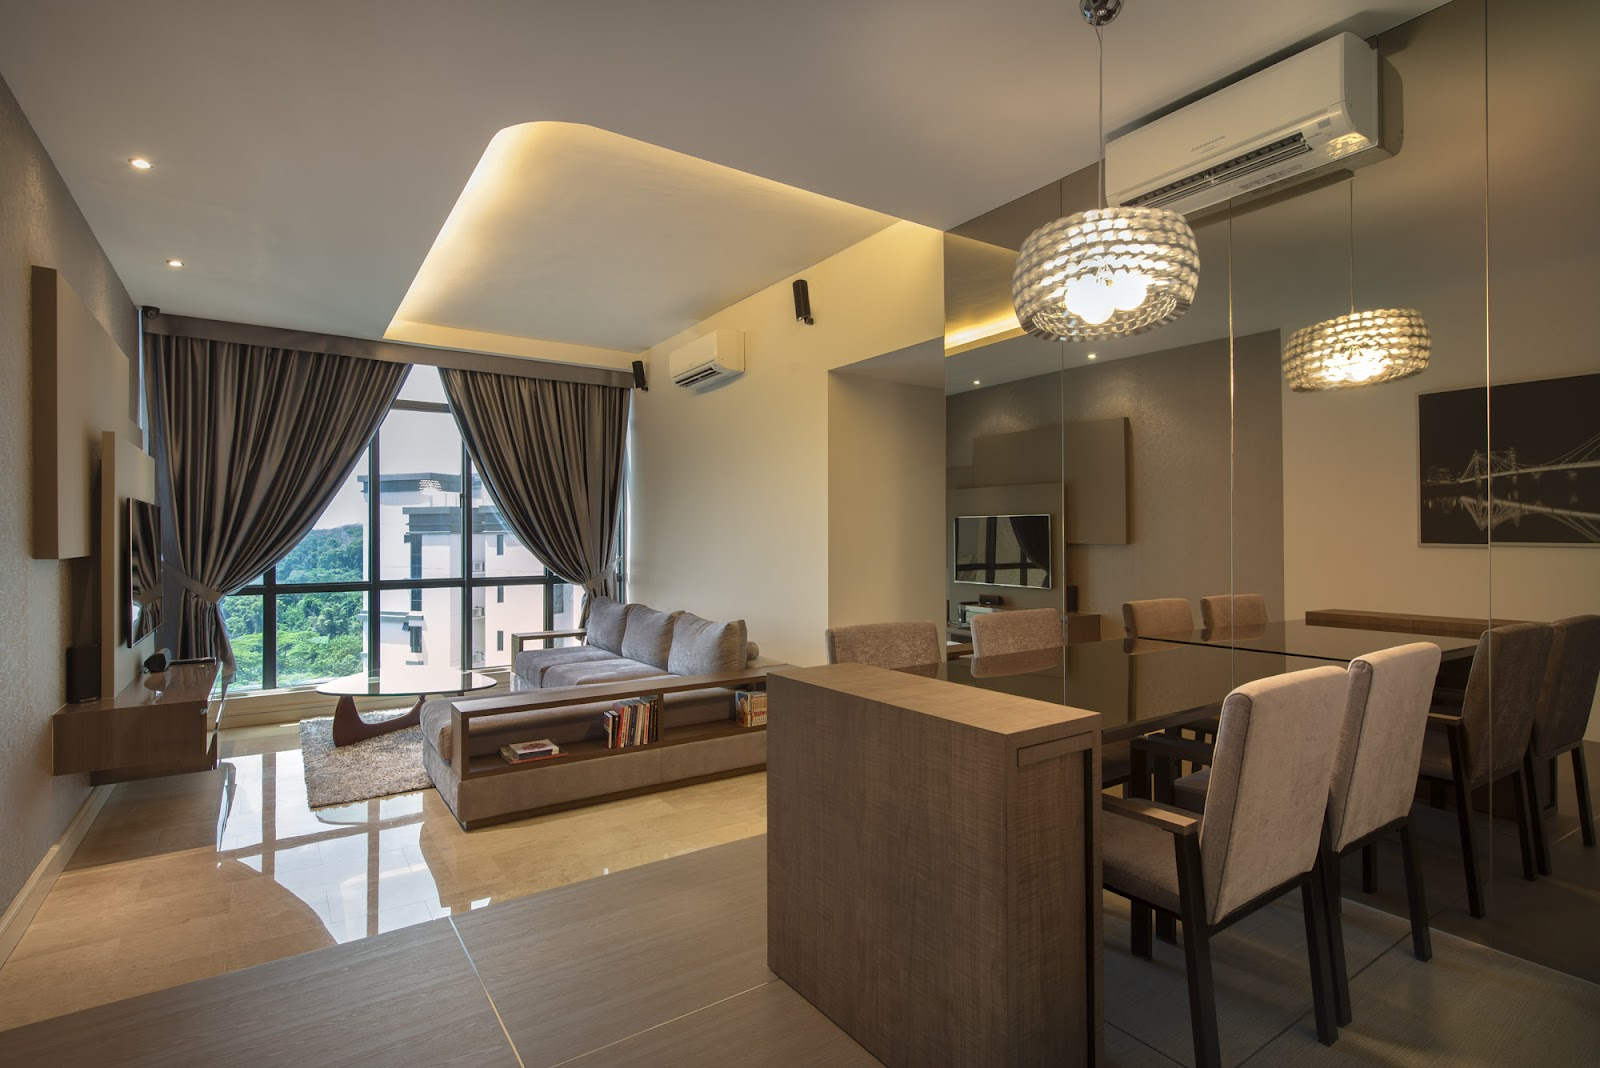 Rezt & Relax Interior Design Regent Heights Condo Project ...